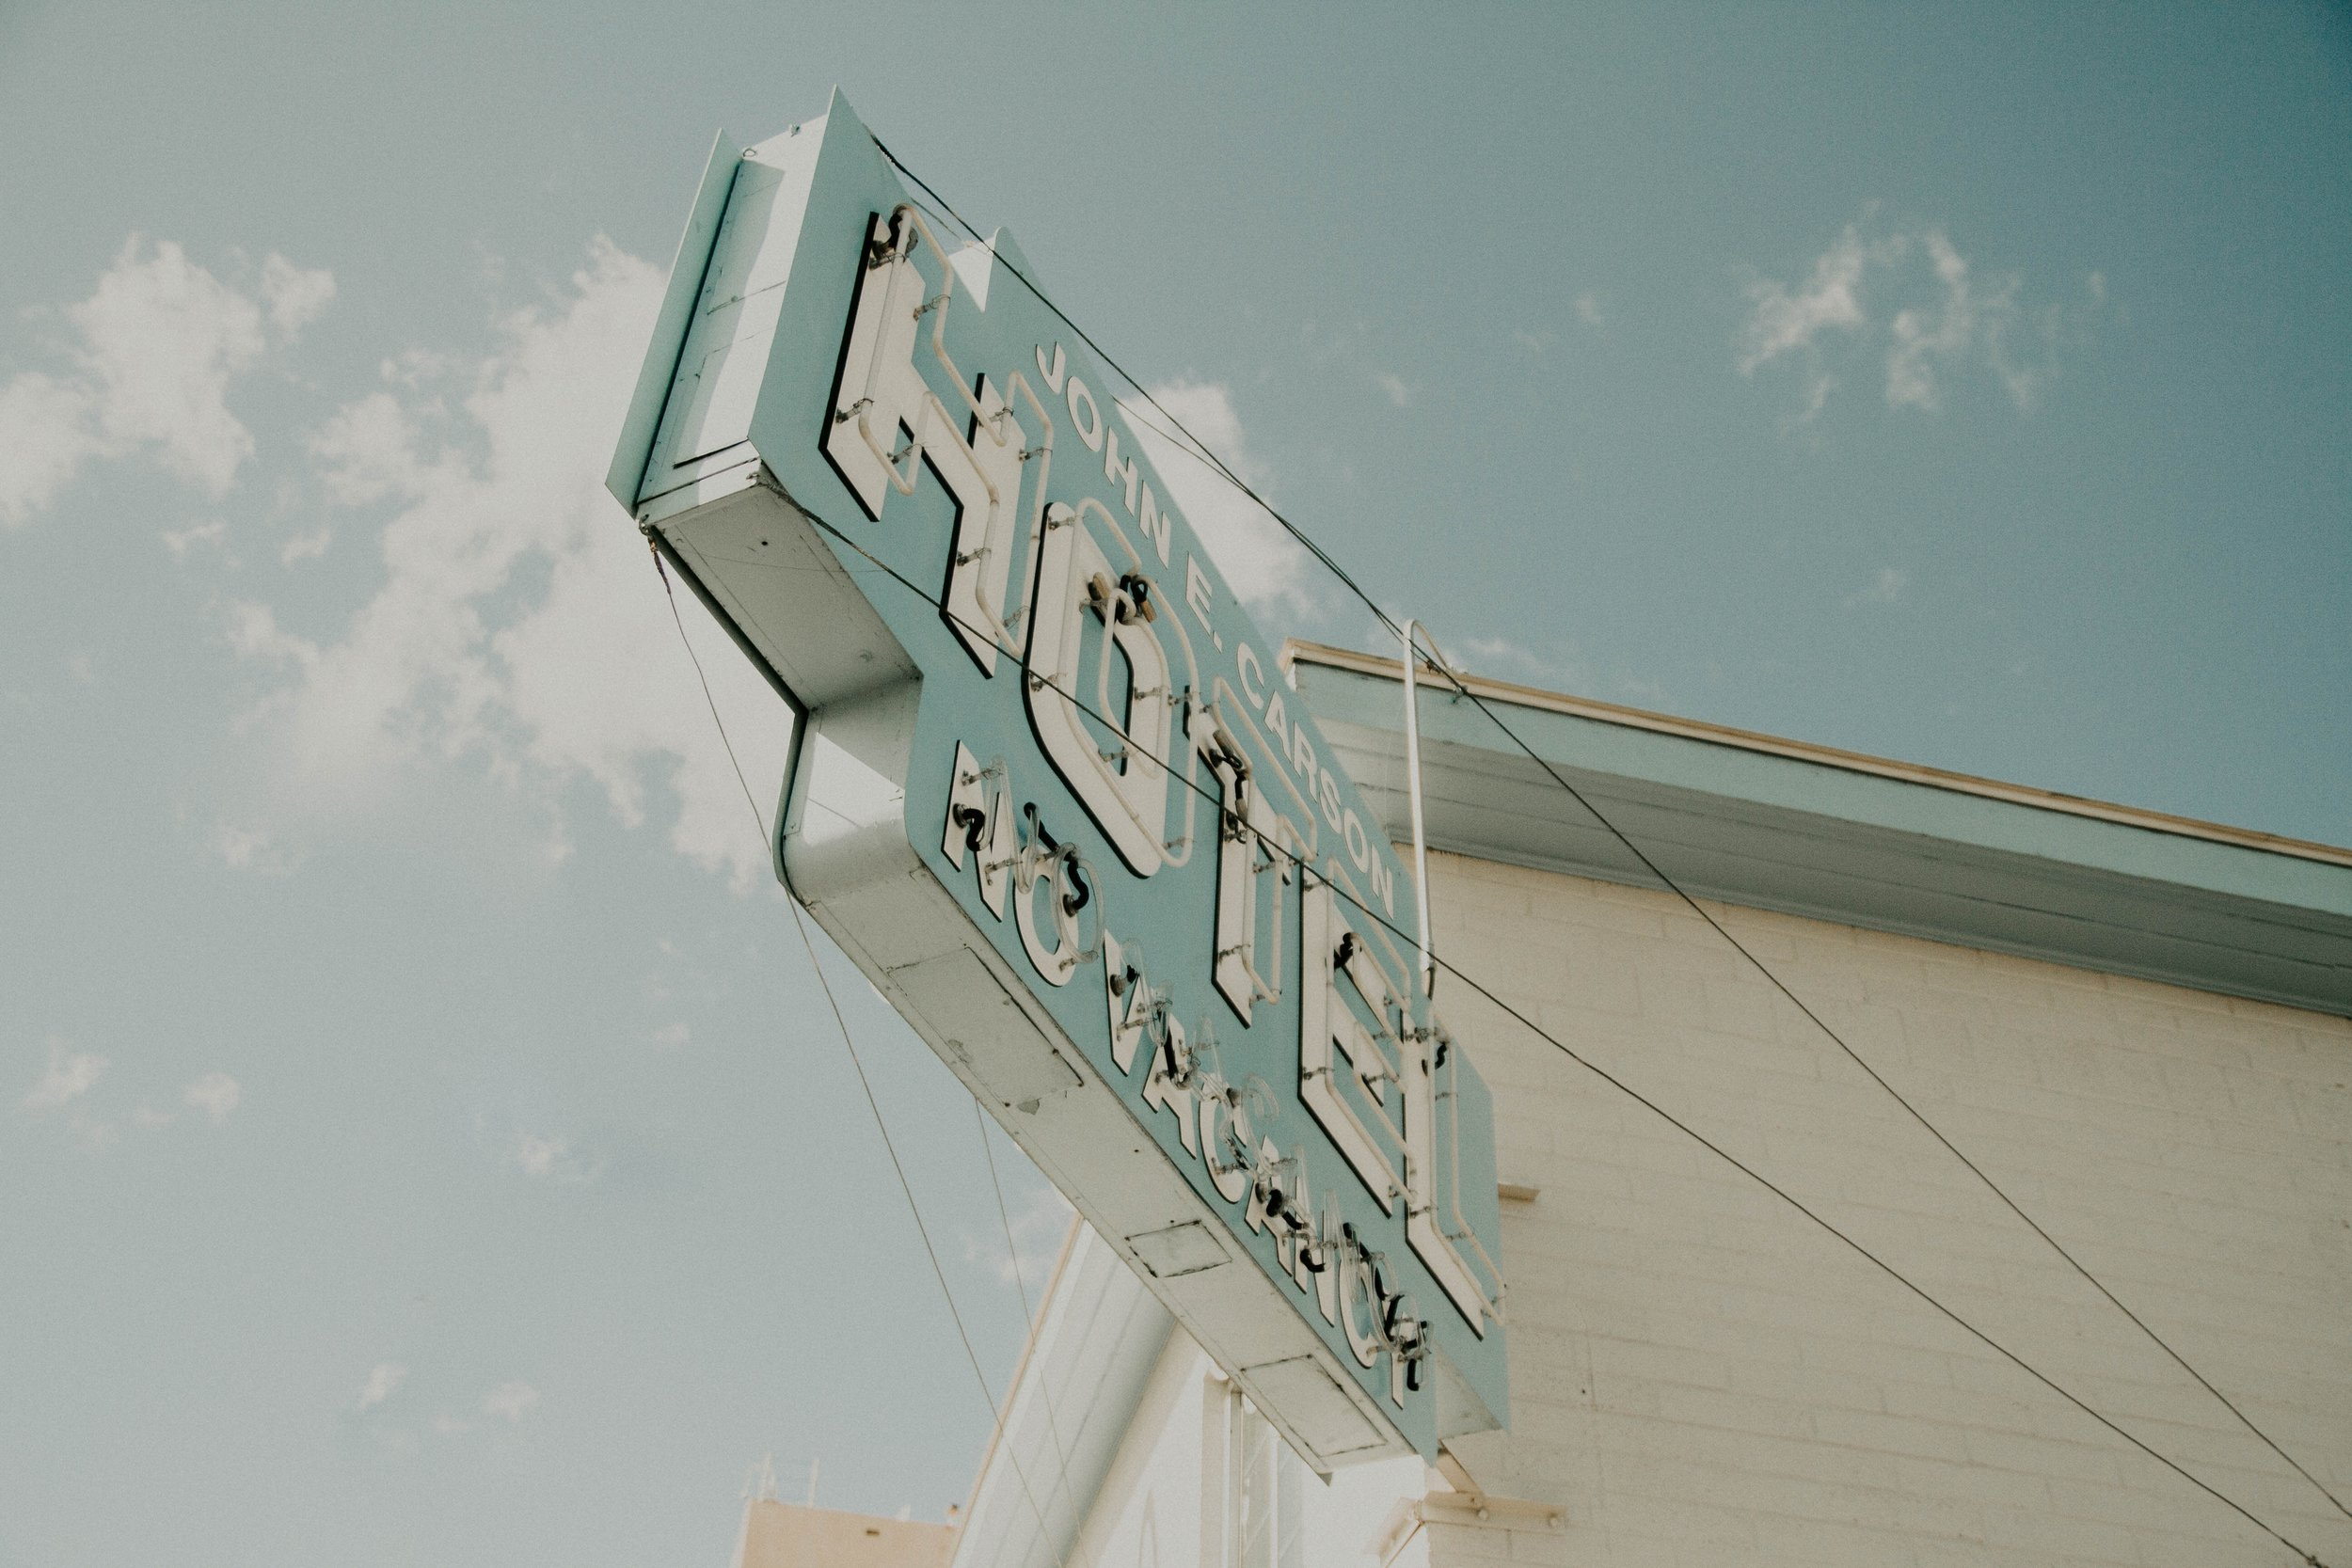 neonbrand-hotel sign-unsplash.jpg